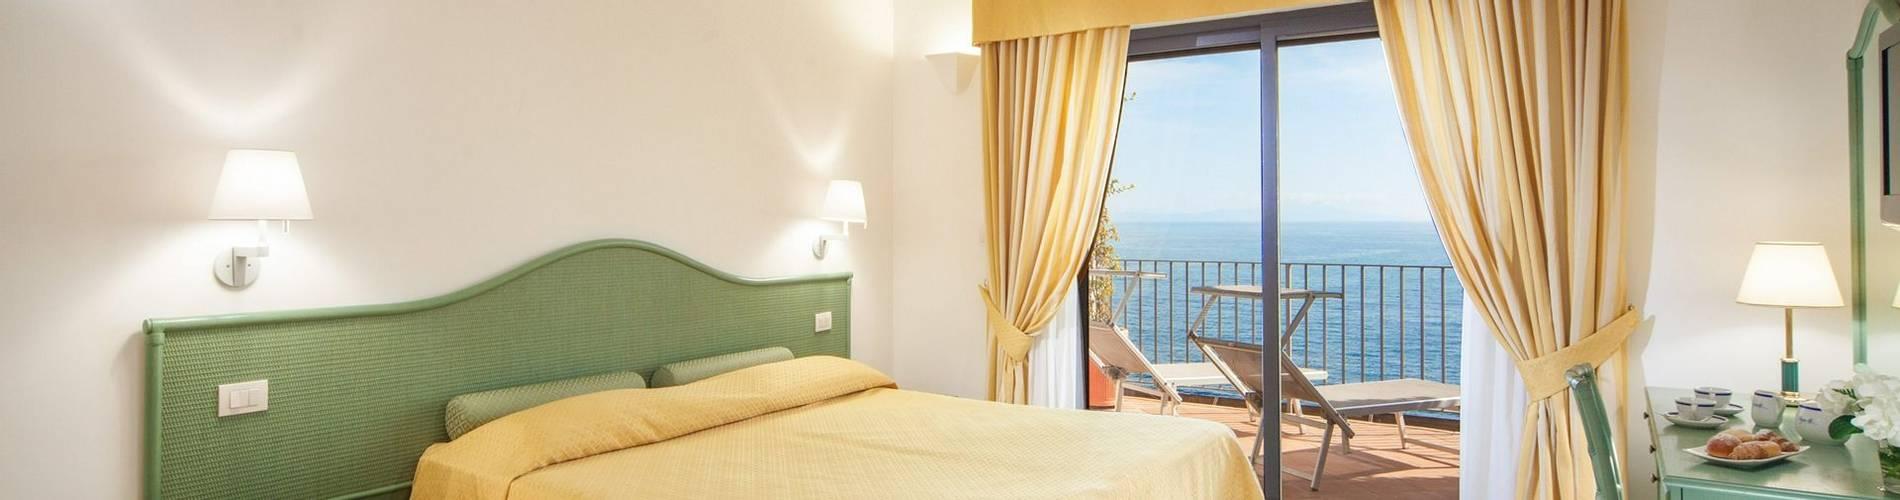 Miramalfi, Amalfi Coast, Italy, Superior (4).jpg